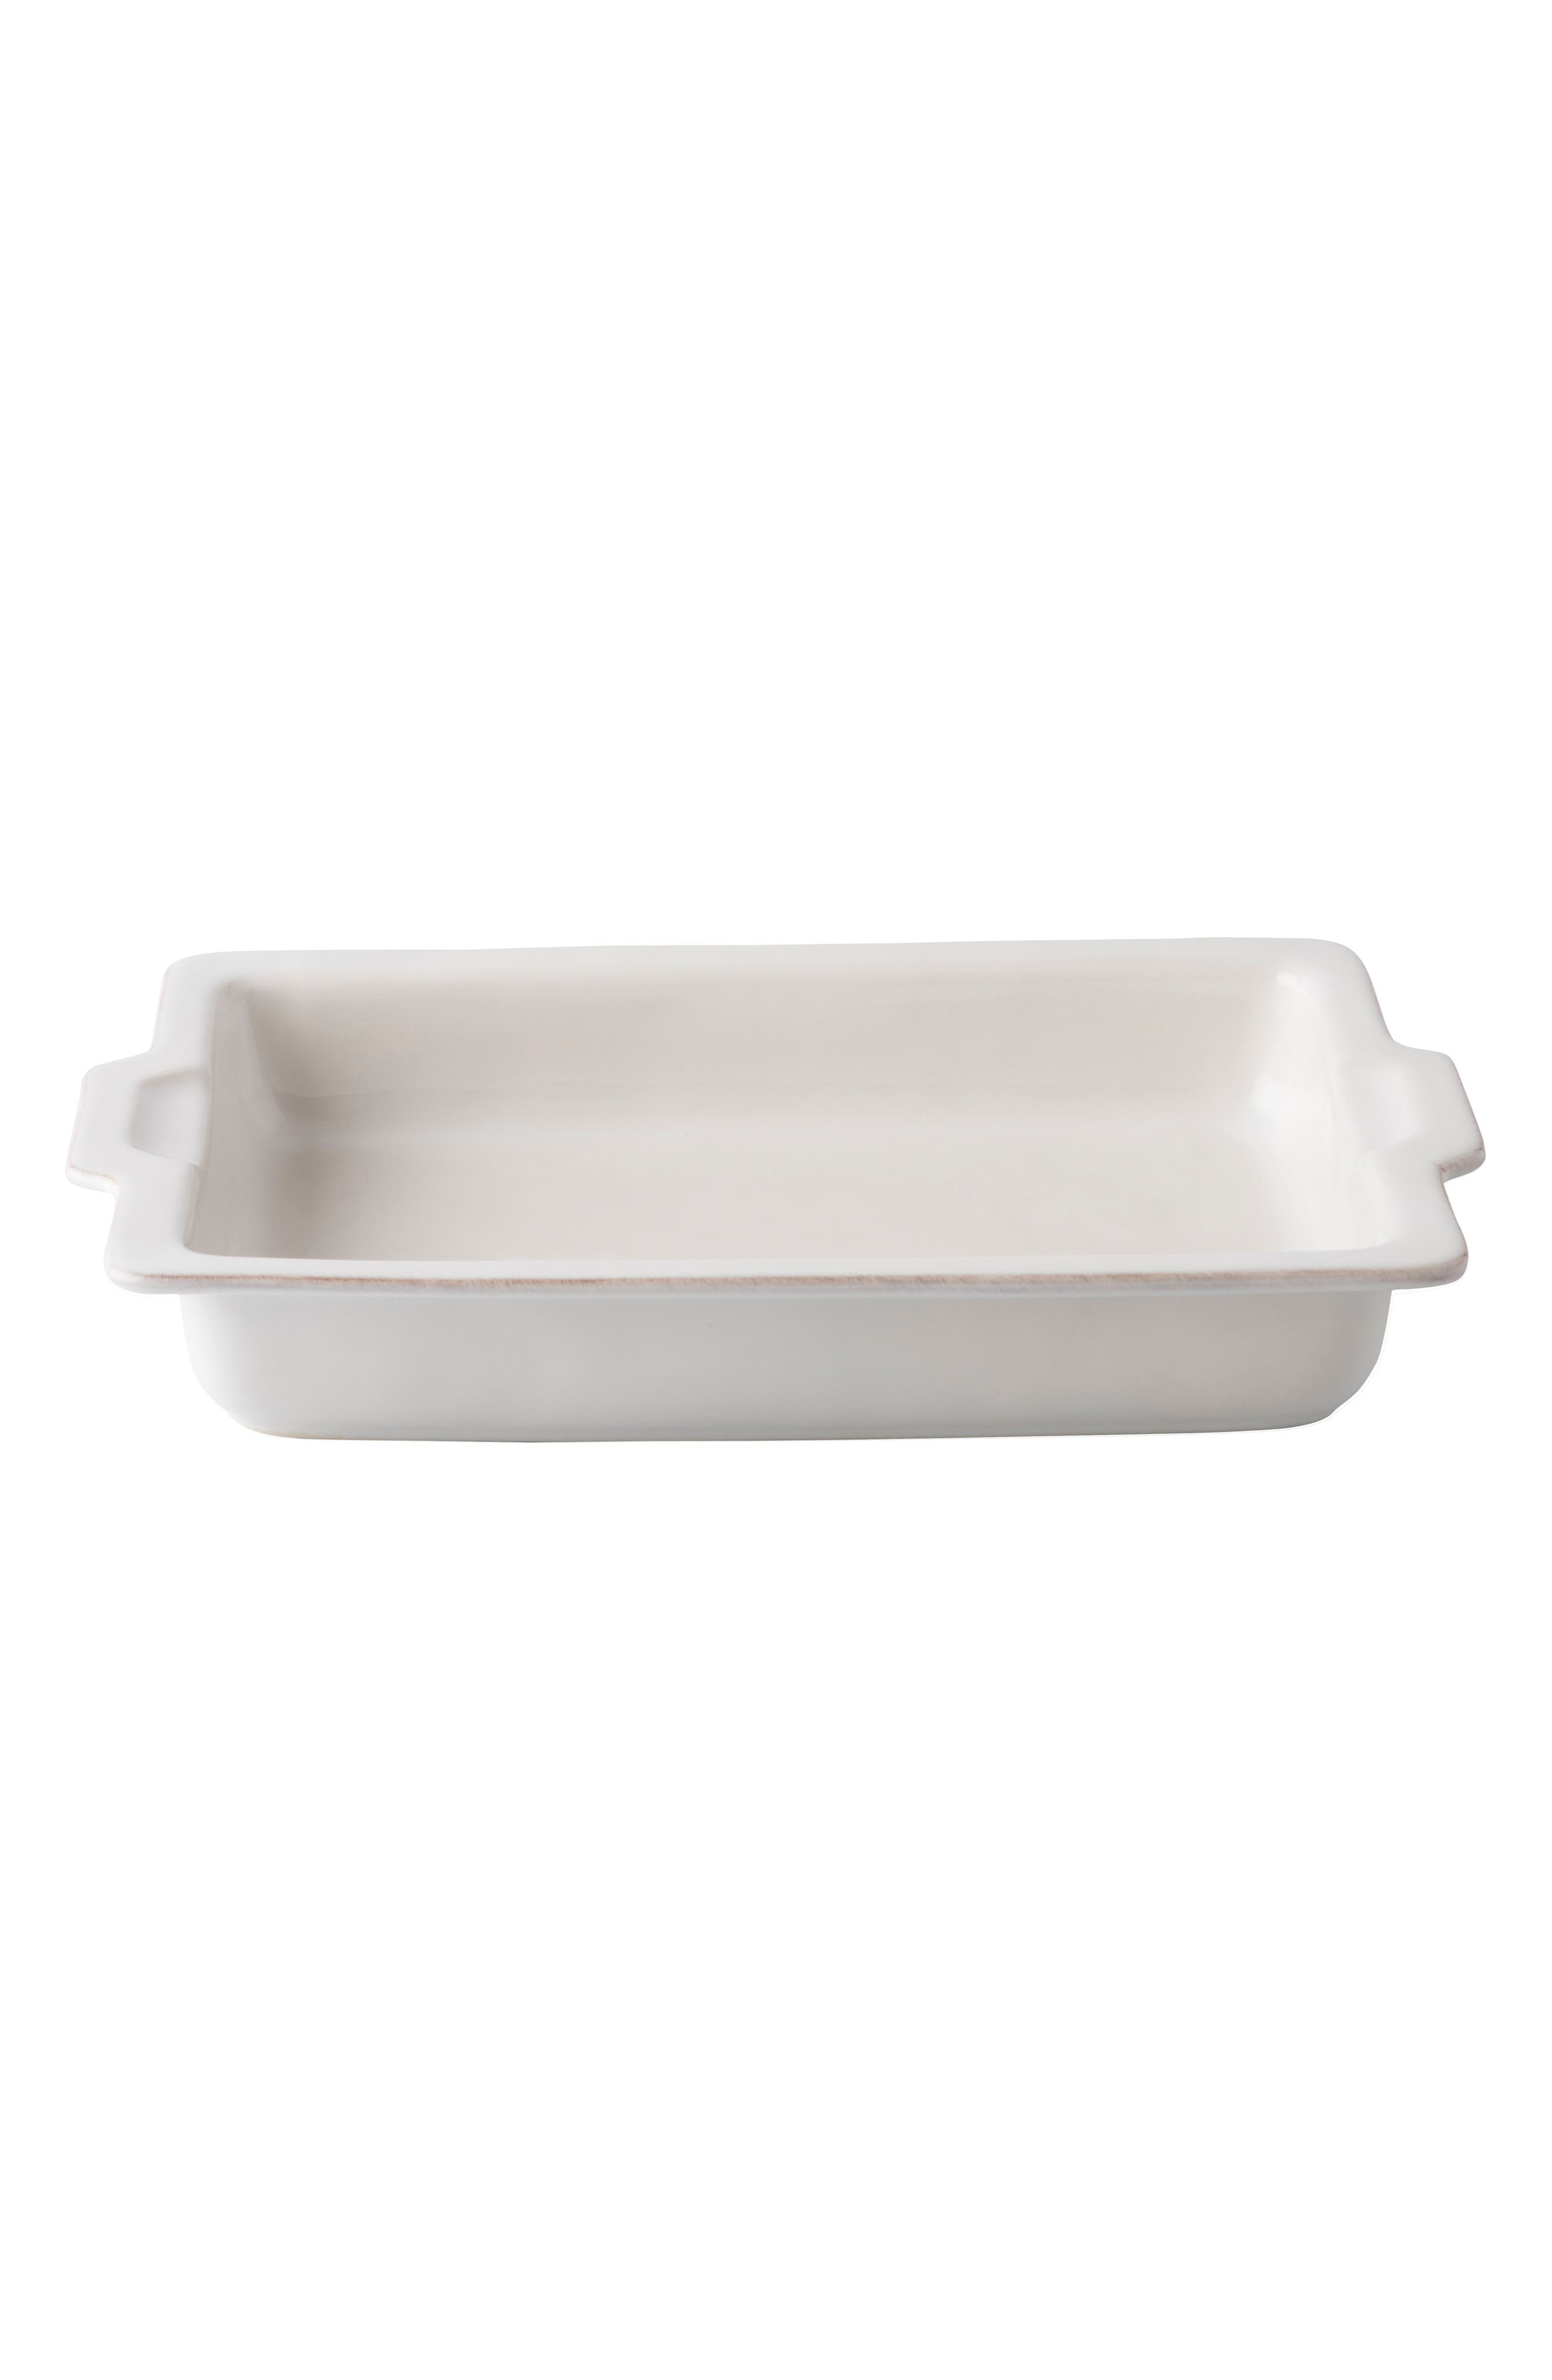 Puro Large Ceramic Baking Dish,                             Main thumbnail 1, color,                             WHITEWASH